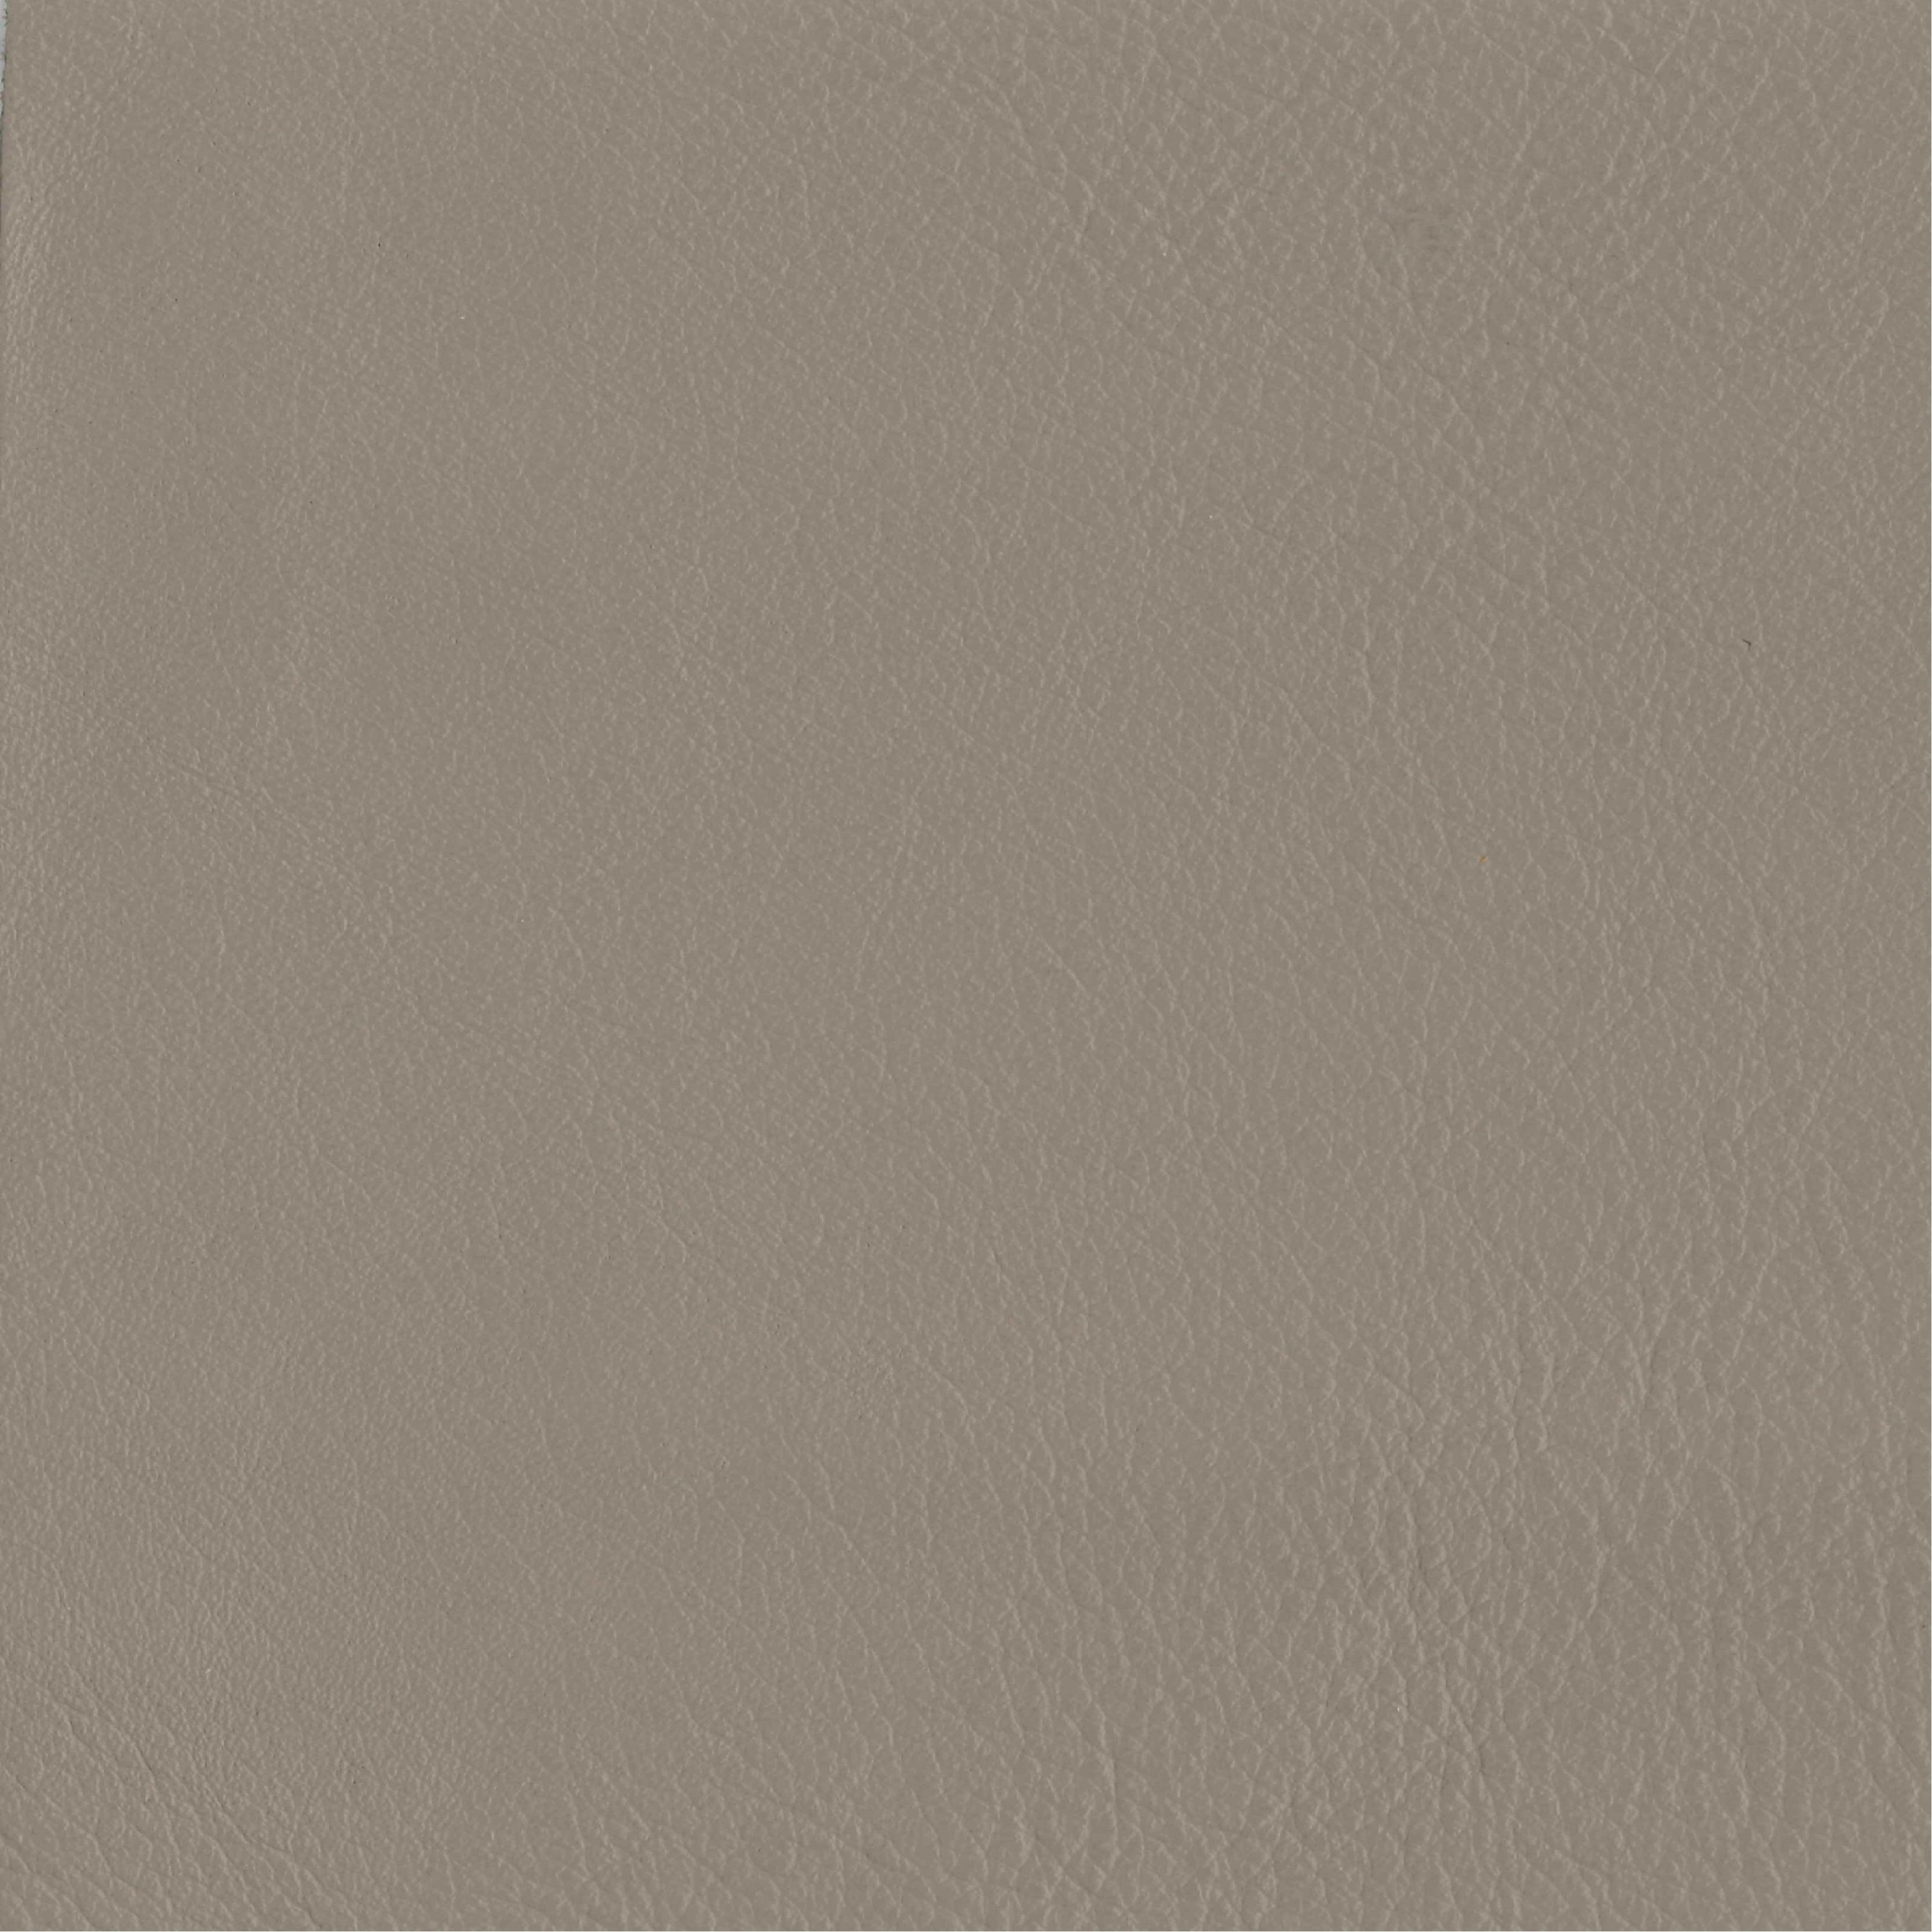 Yarwood Leather Capri Clay